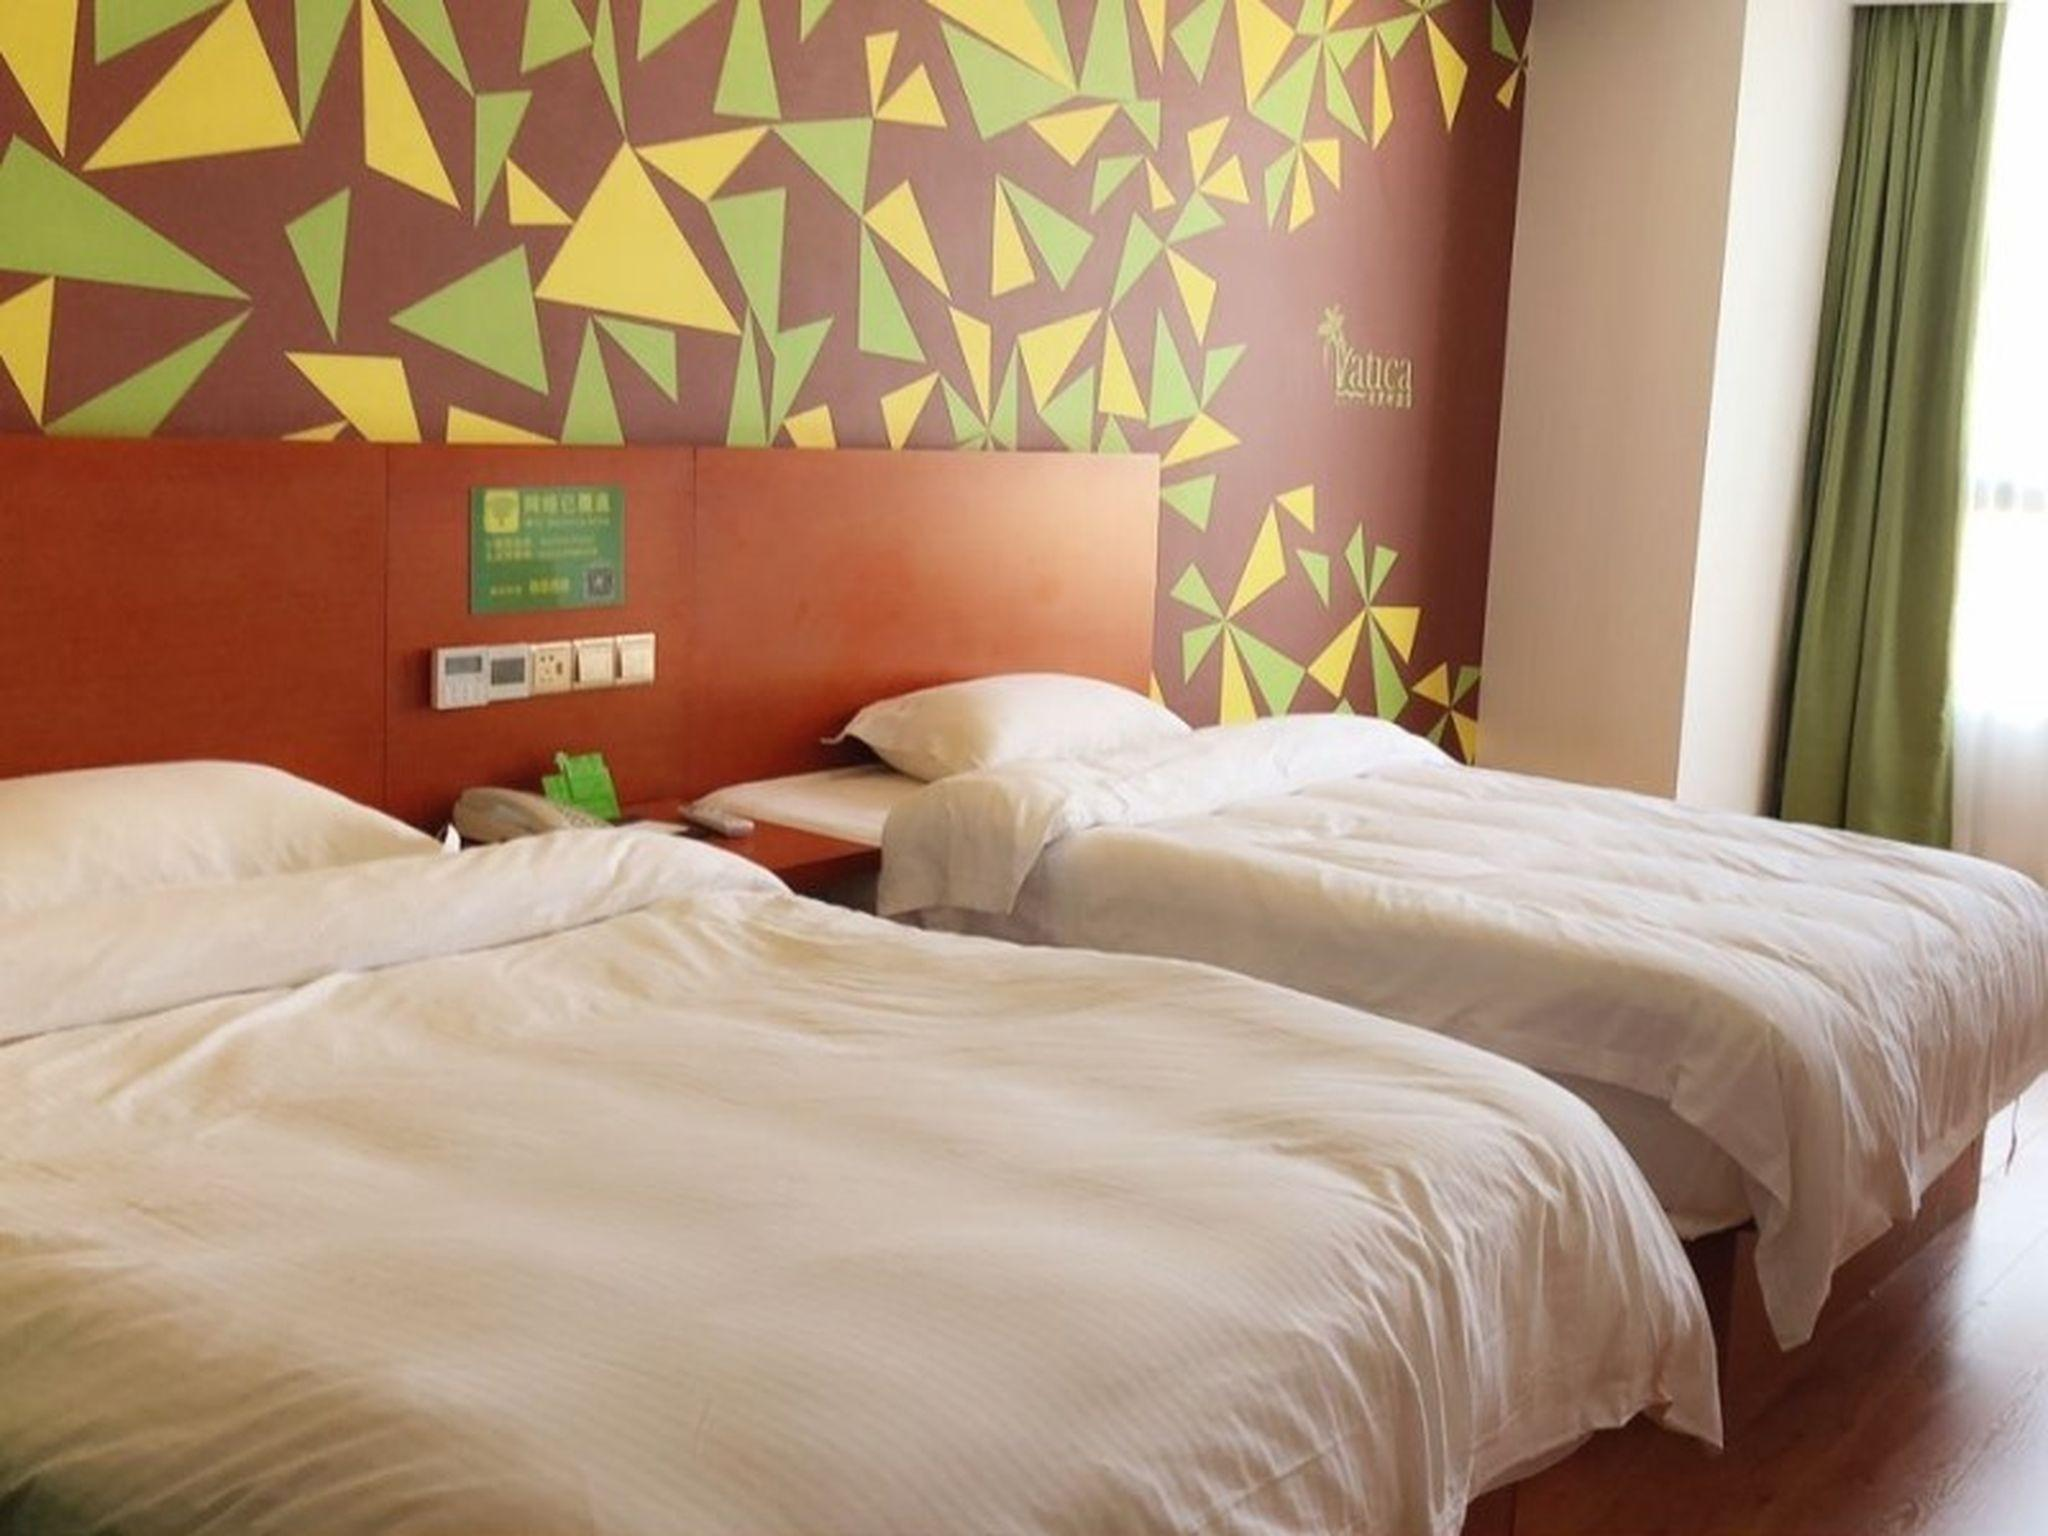 Vatica Hotel Fuyang Linquan Tenghui International City Branch